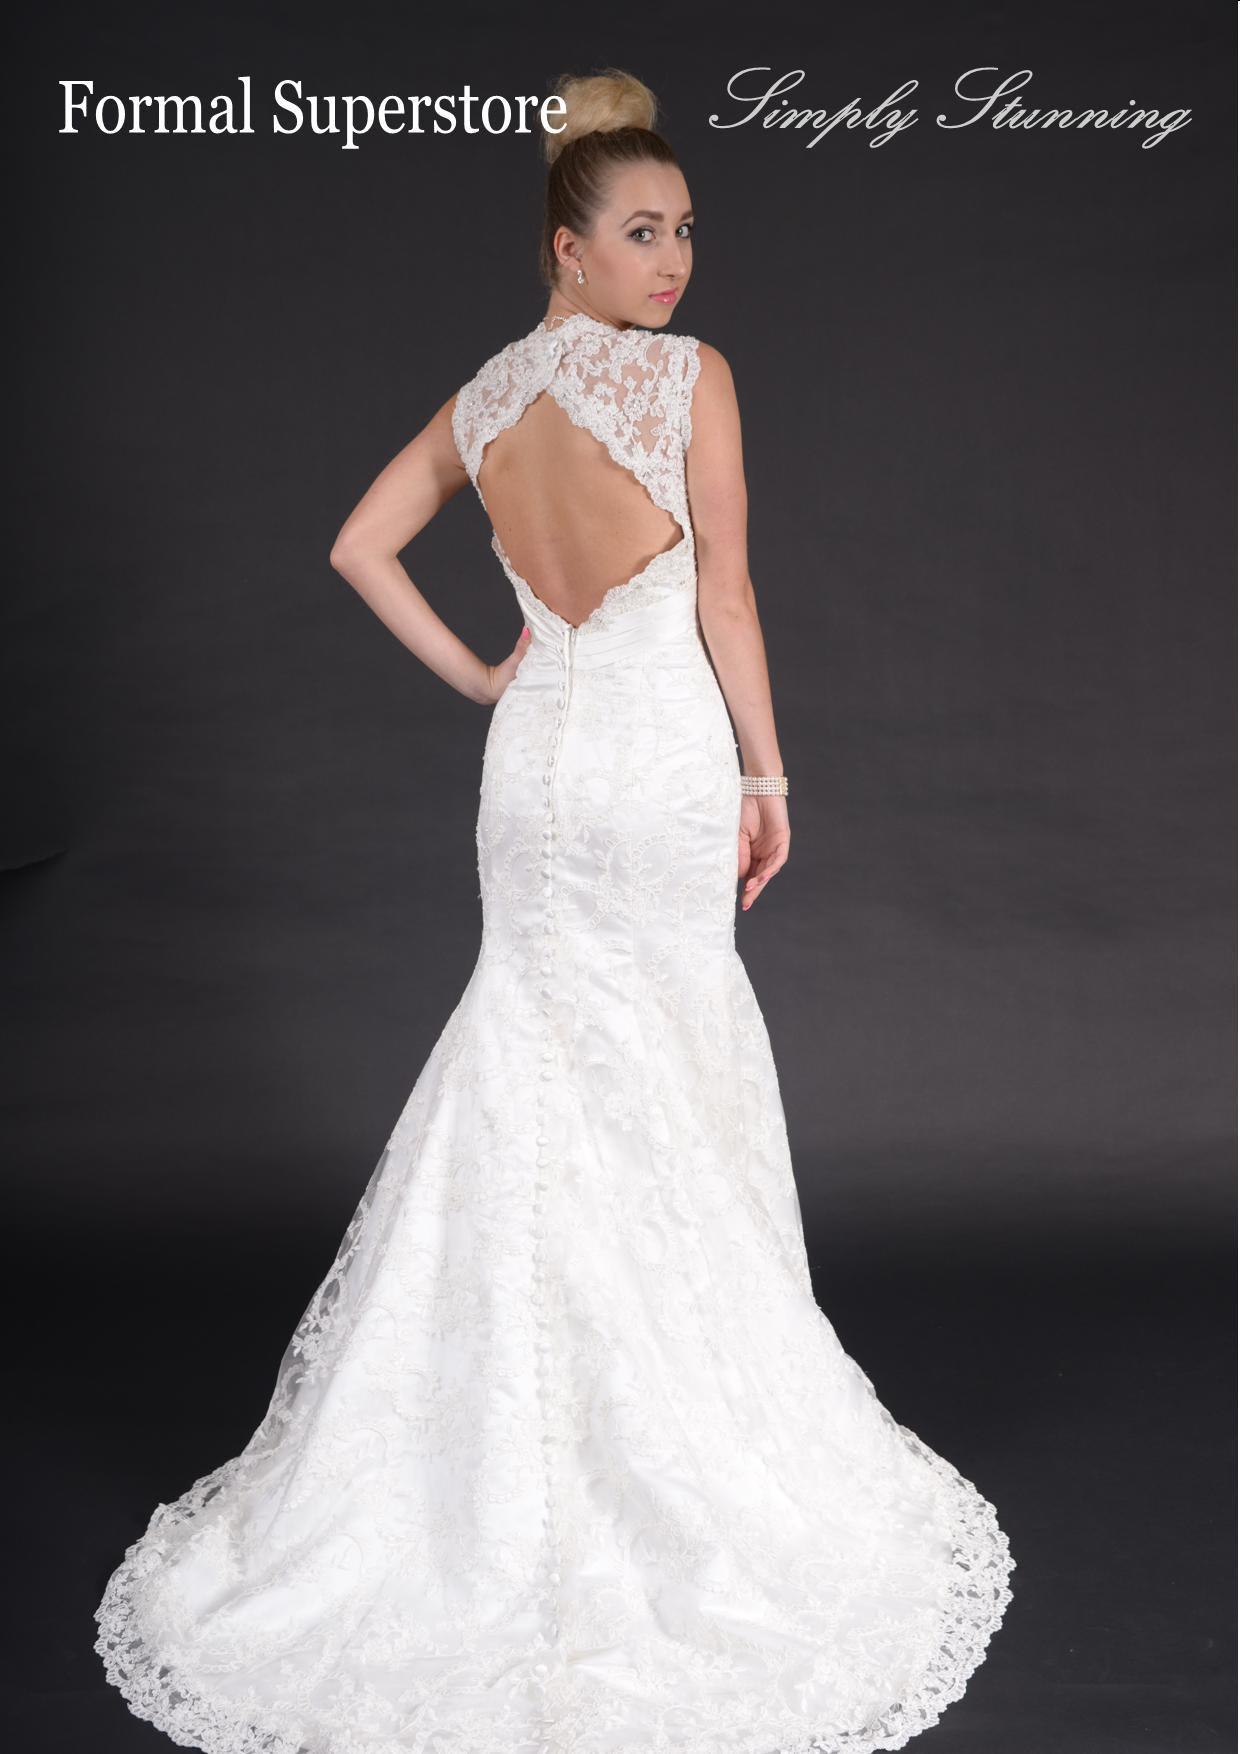 Formal | Bridesmaid Wedding Dresses|Bridal Shops| Brisbane ...